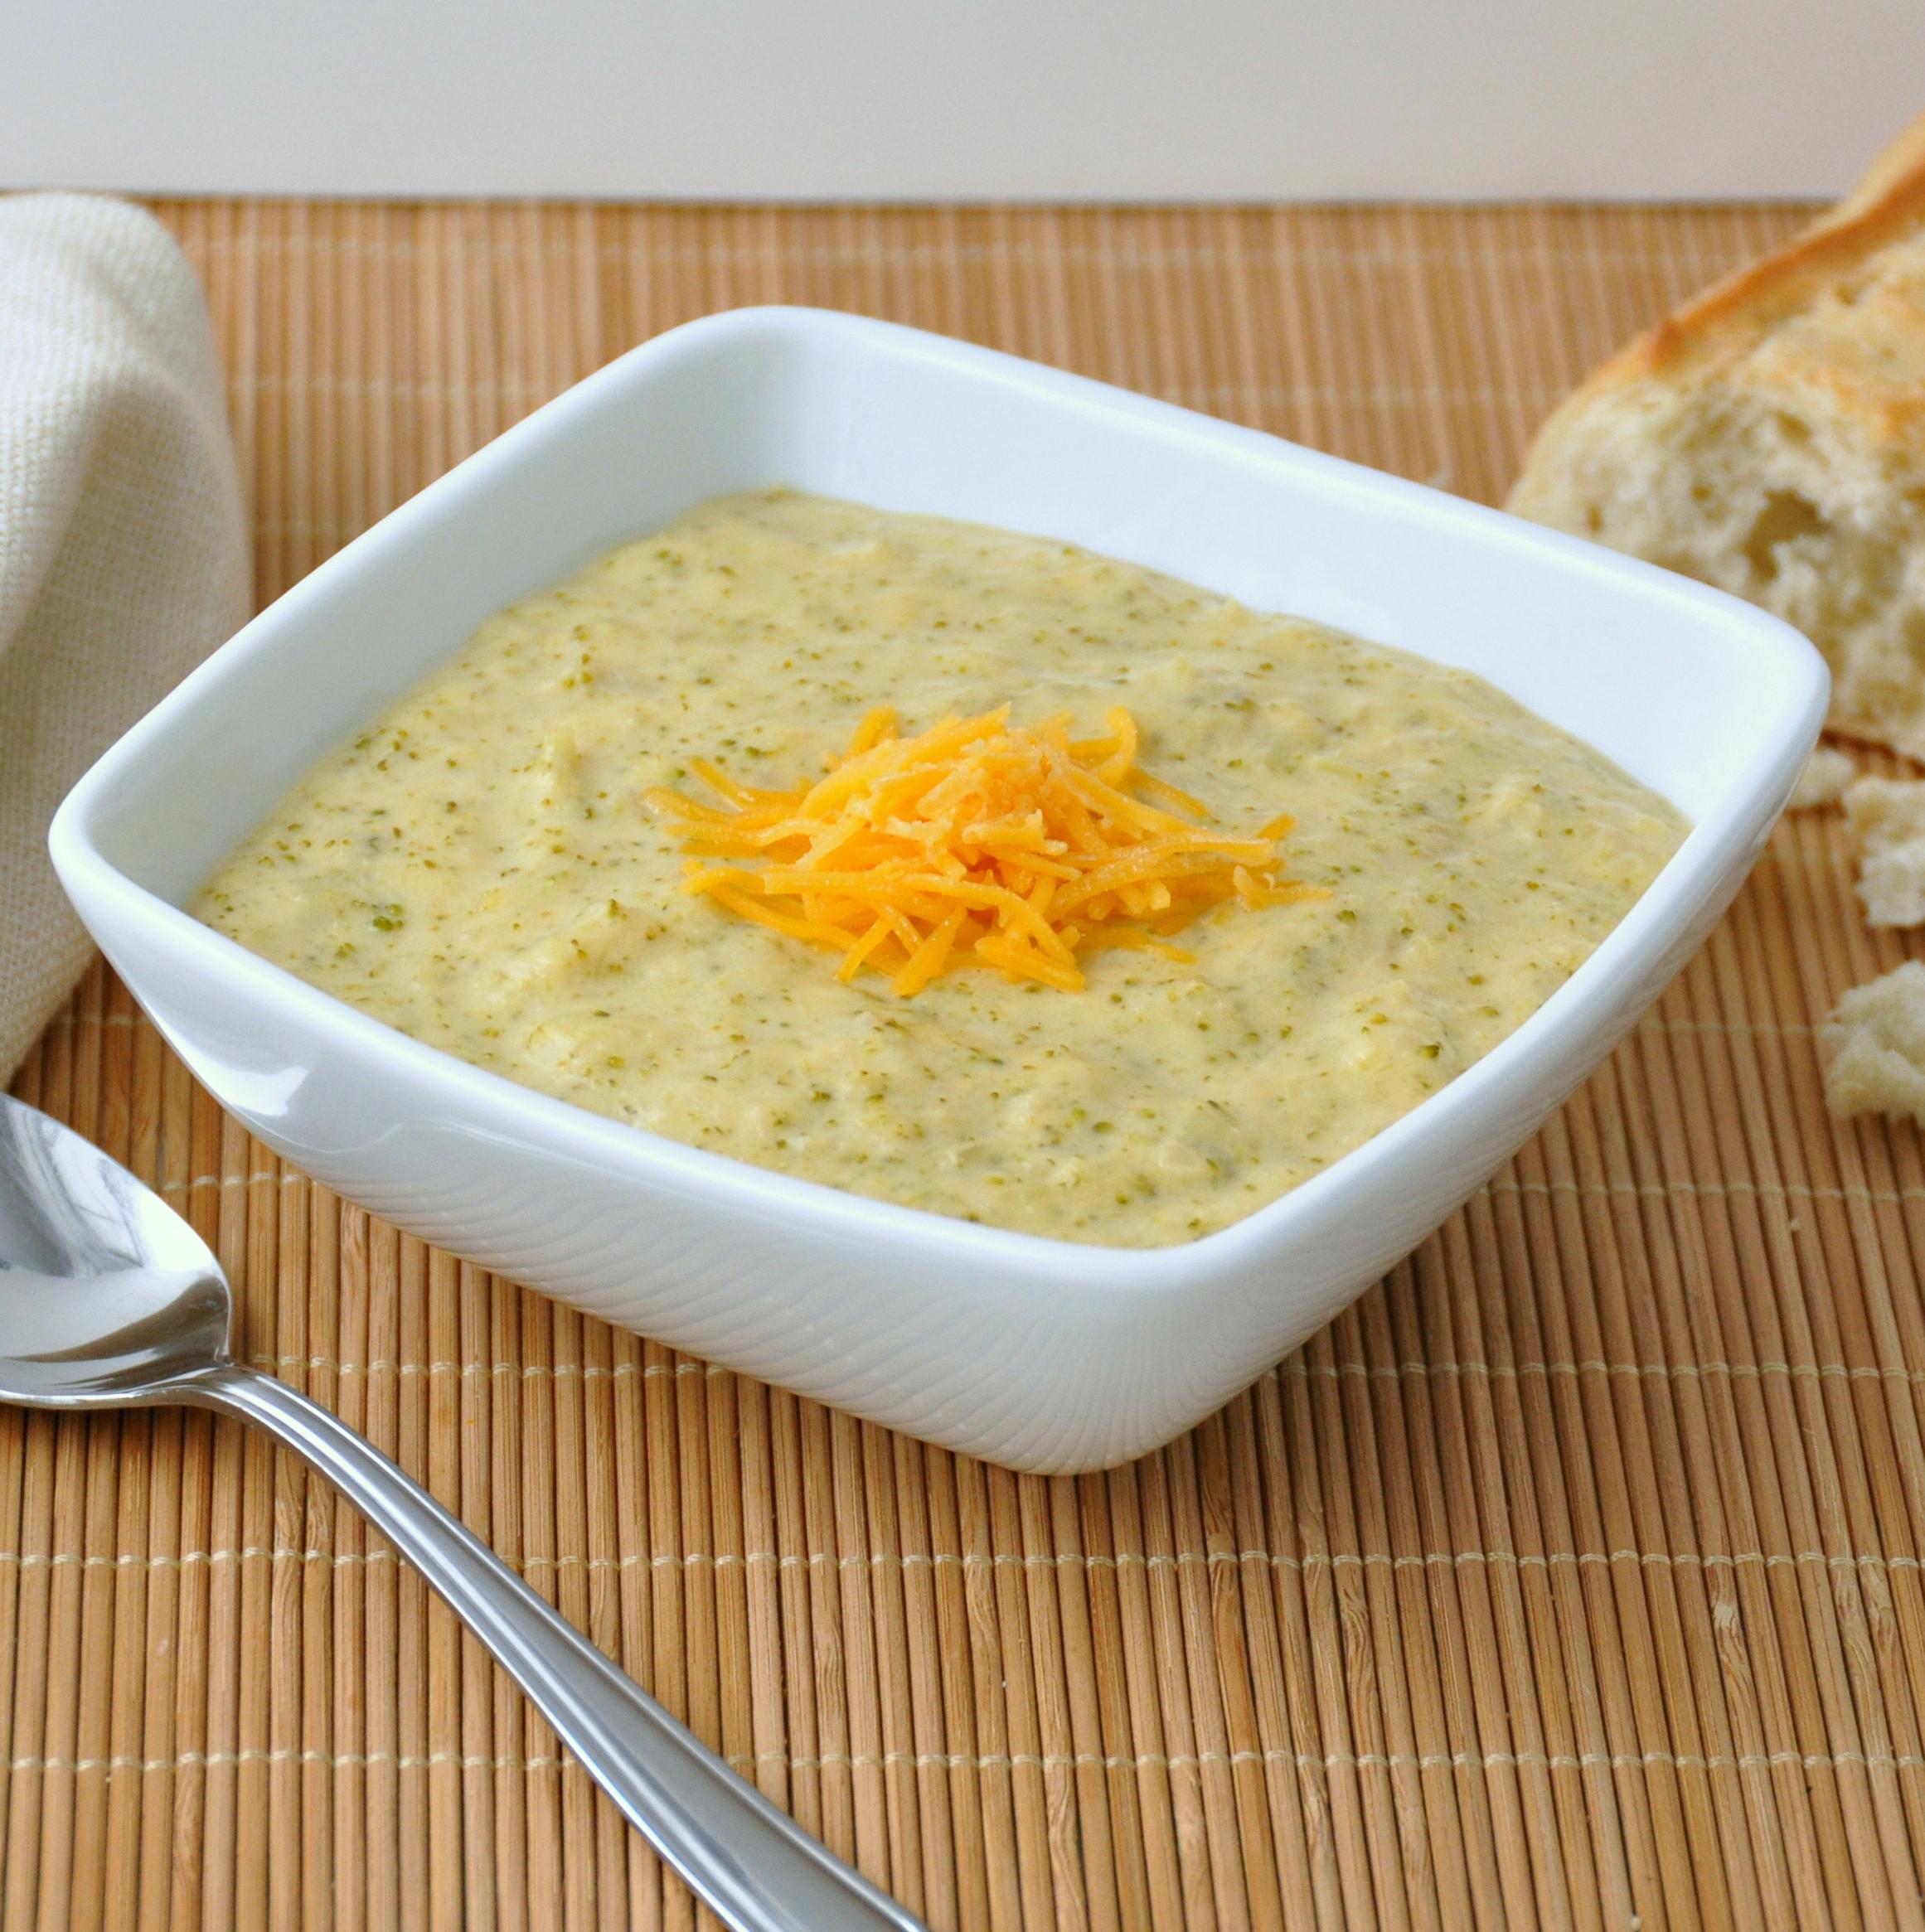 Panera Broccoli Cheddar Soup Recipe  Broccoli Cheddar Soup – The Way to His Heart